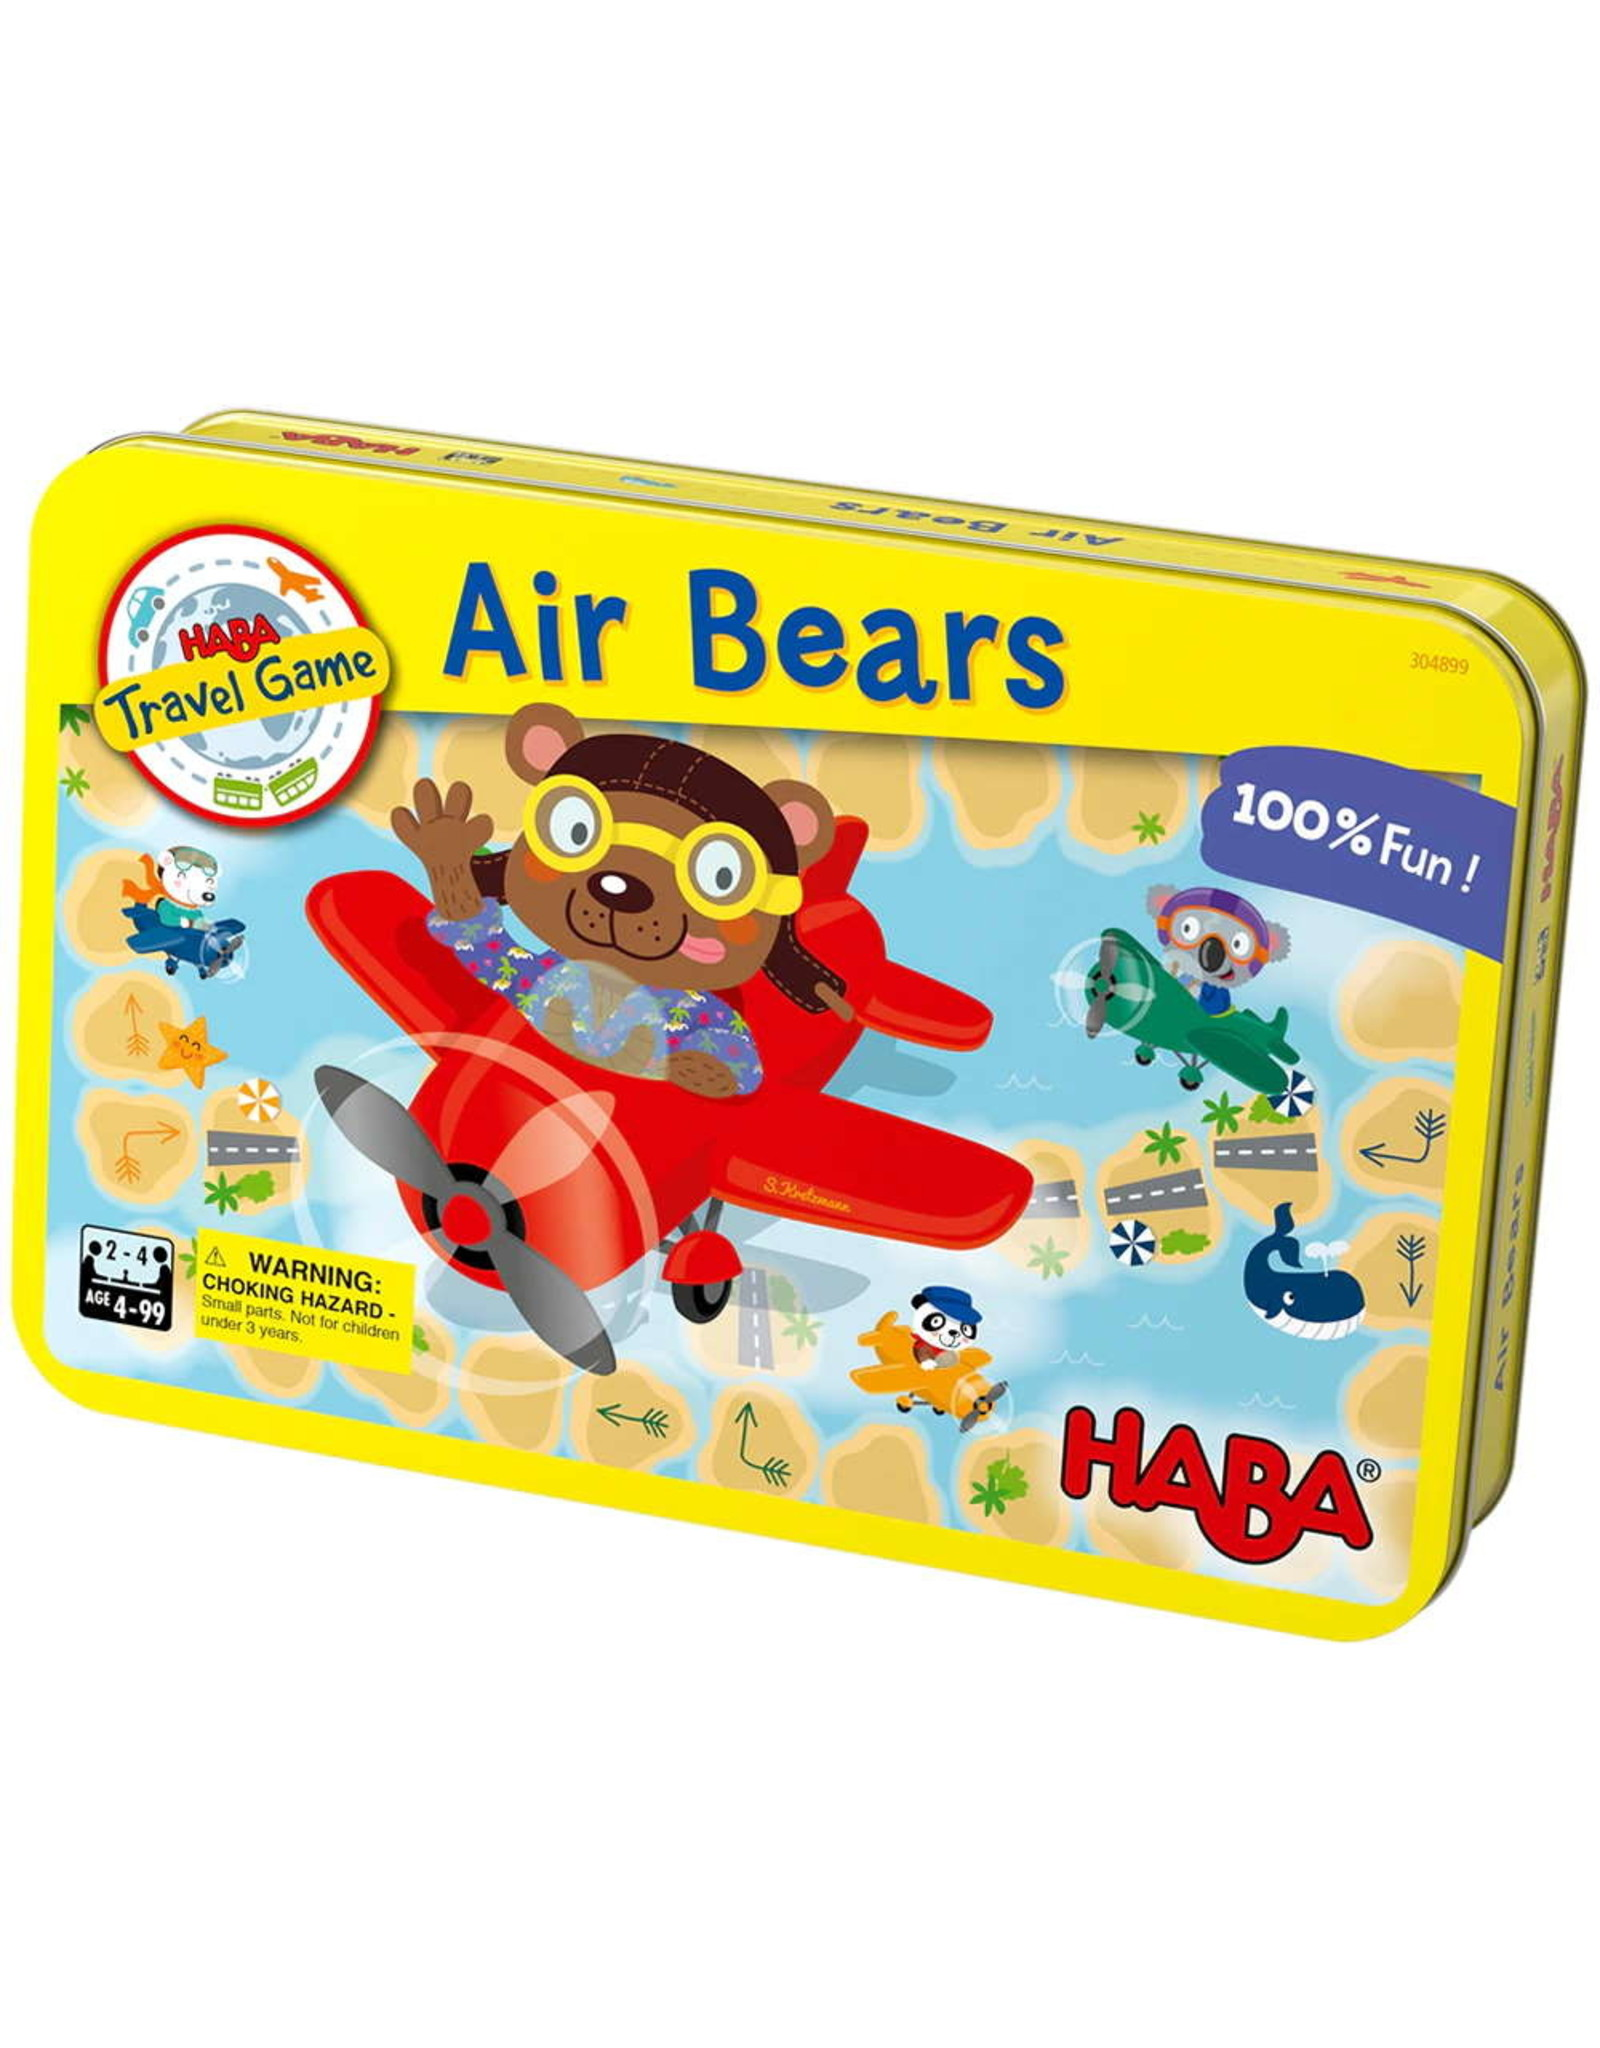 HABA GAMES AIR BEARS